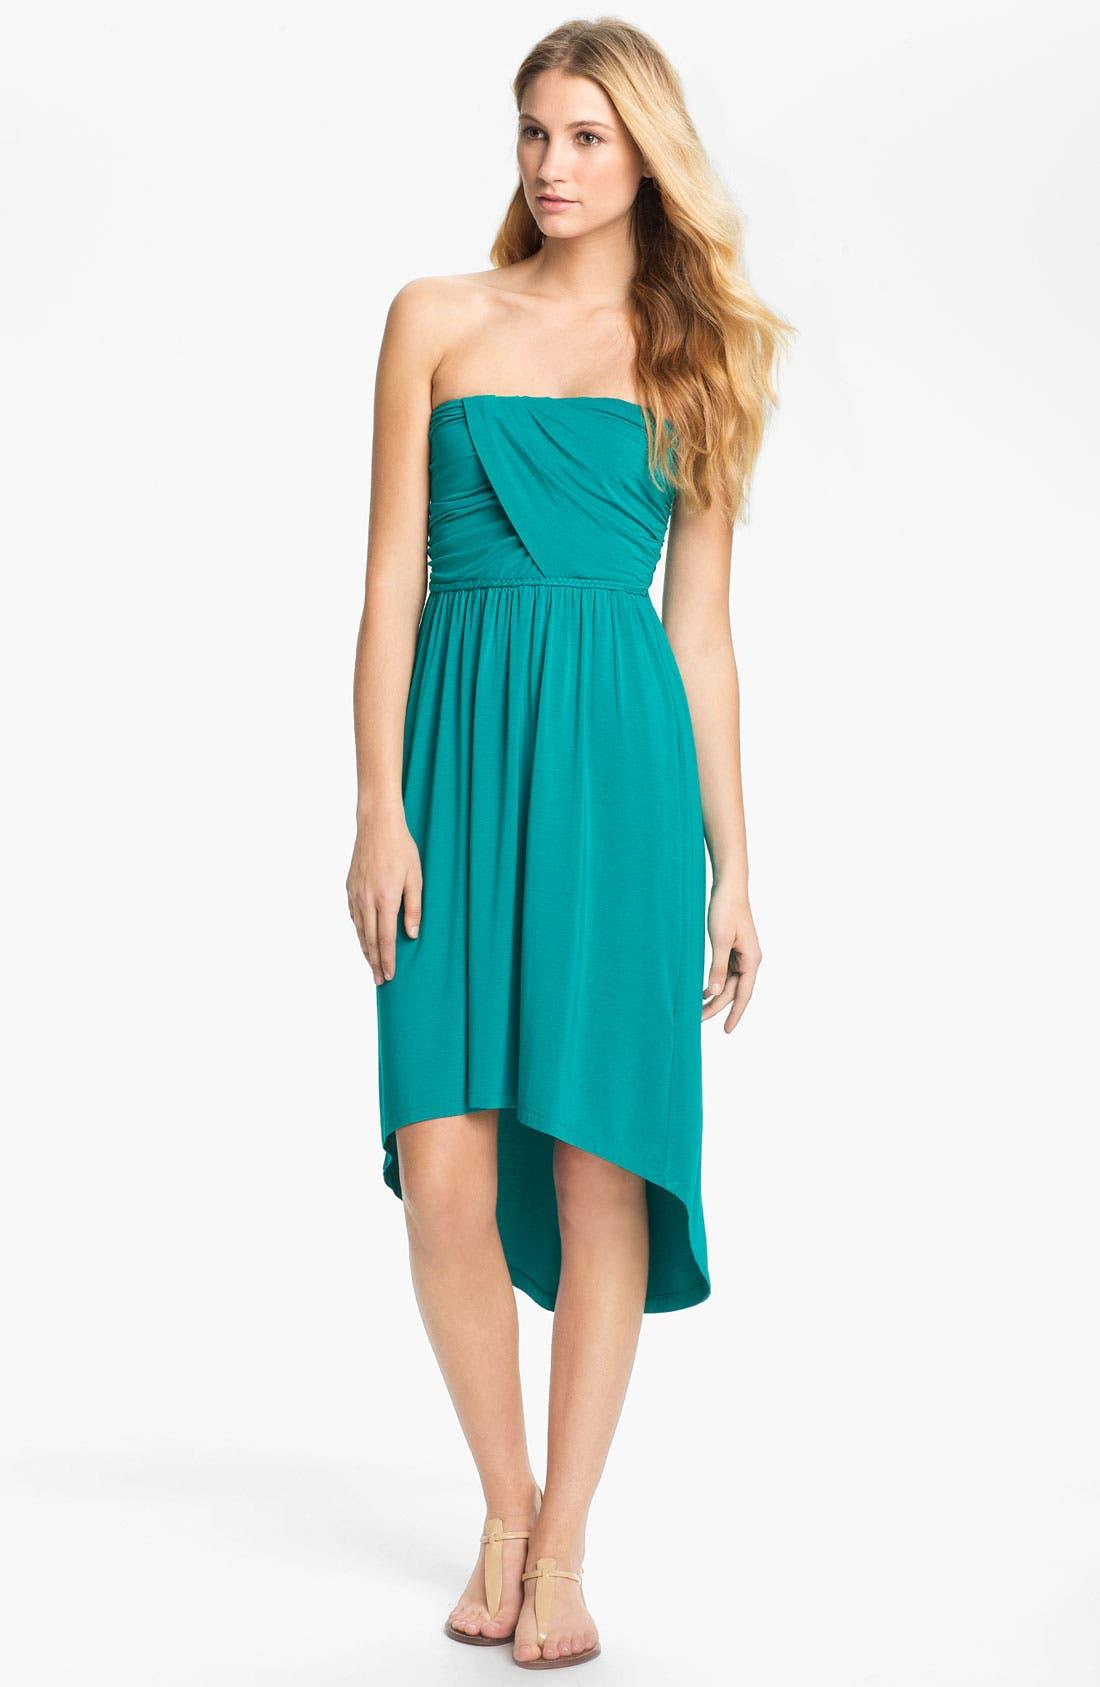 Alternate Image 1 Selected - Tart 'Delaney' Strapless Shirred Jersey High/Low Dress